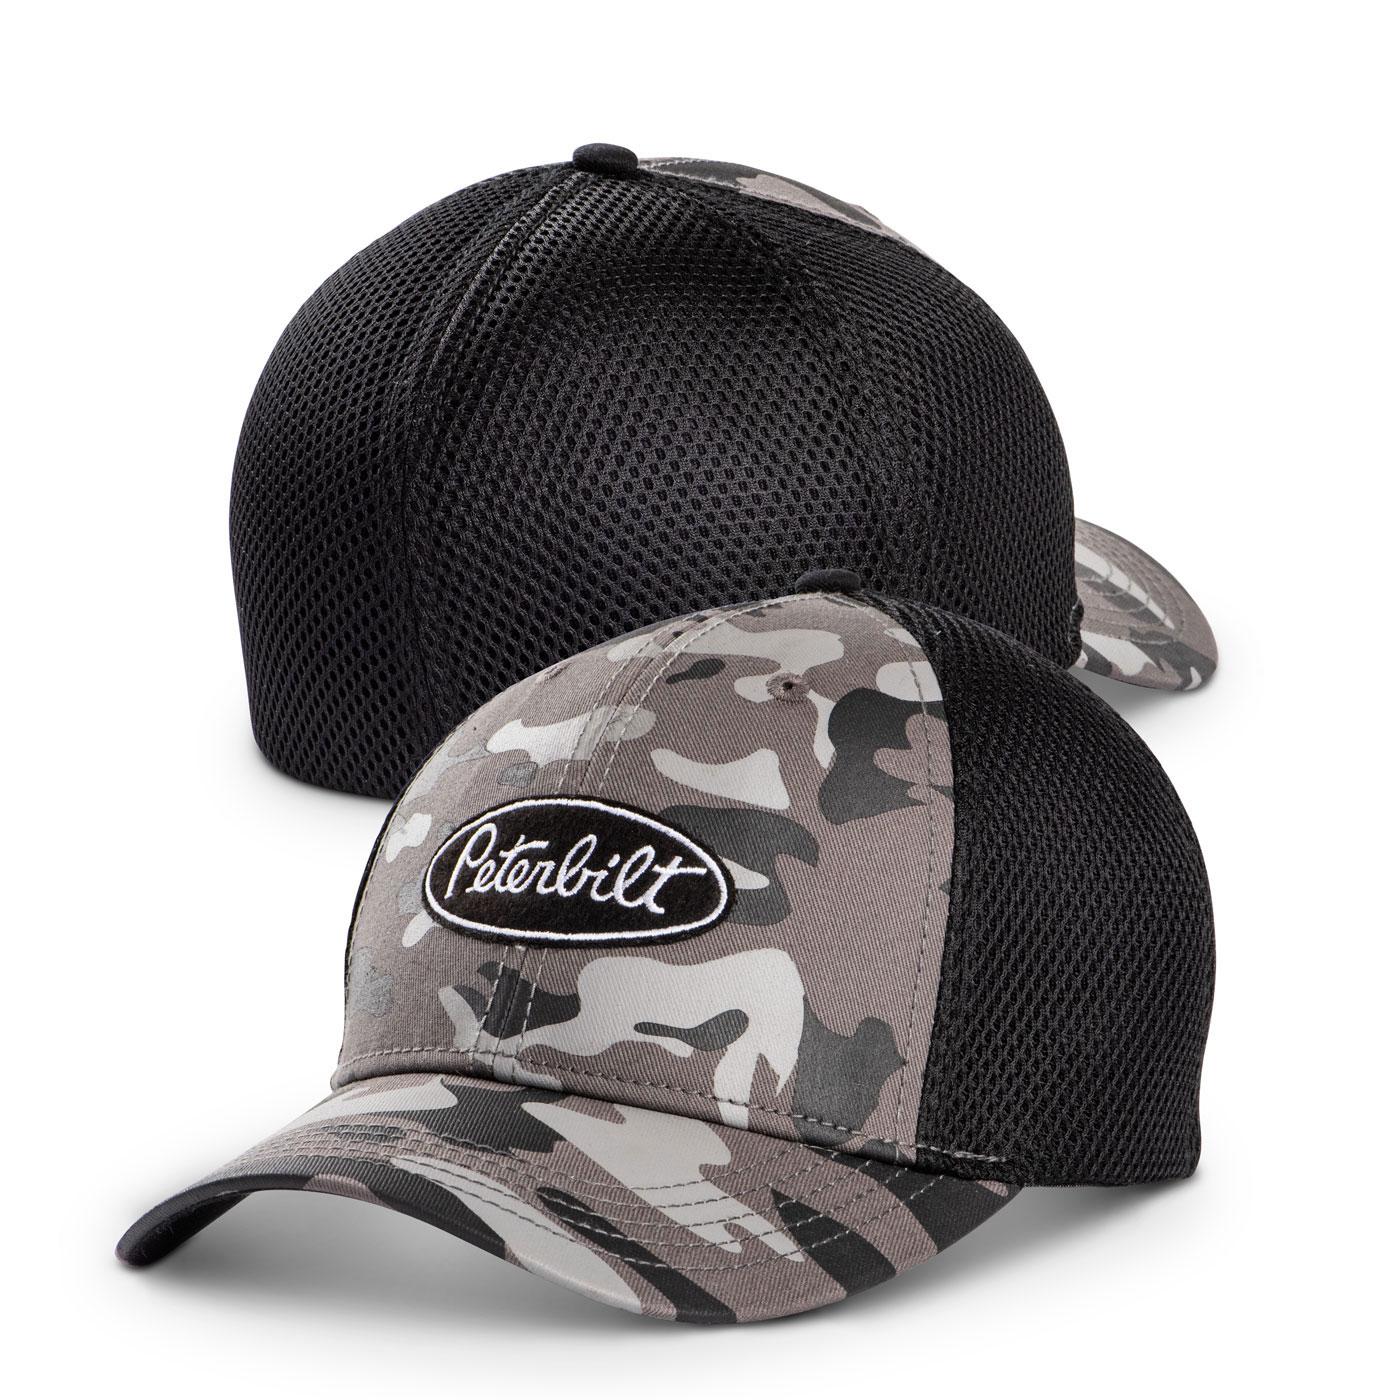 Peterbilt Trucker hat Mesh Hat Navy Blue adjustable new hat